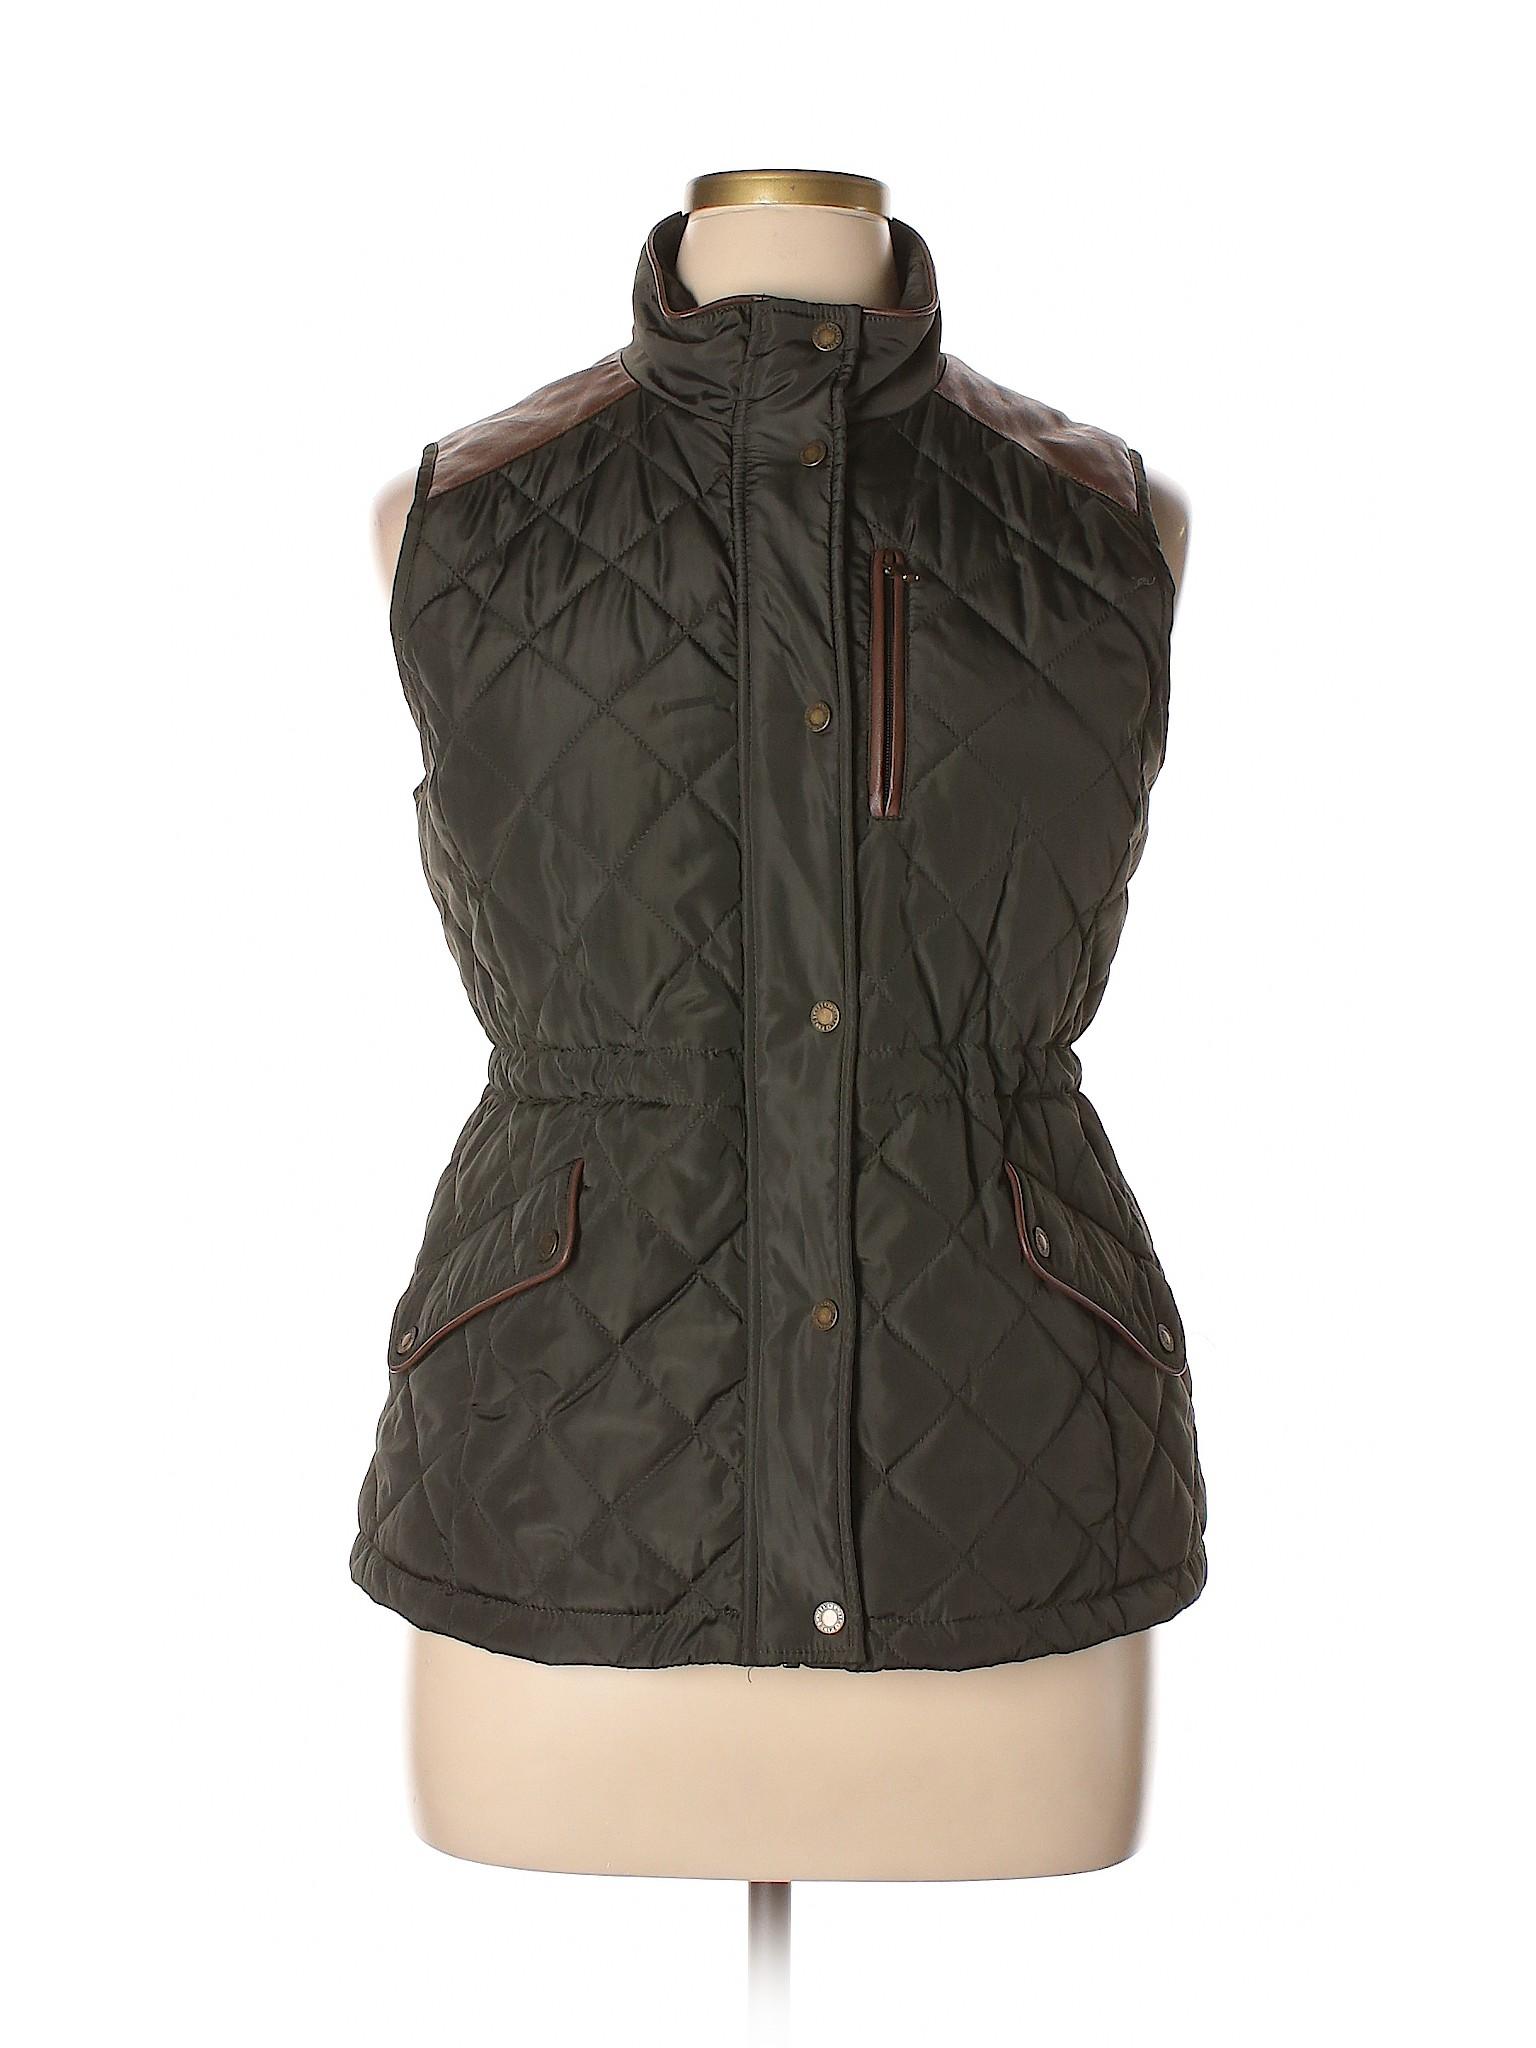 Boutique By Lauren Leisure Vest Ralph 667Xwr